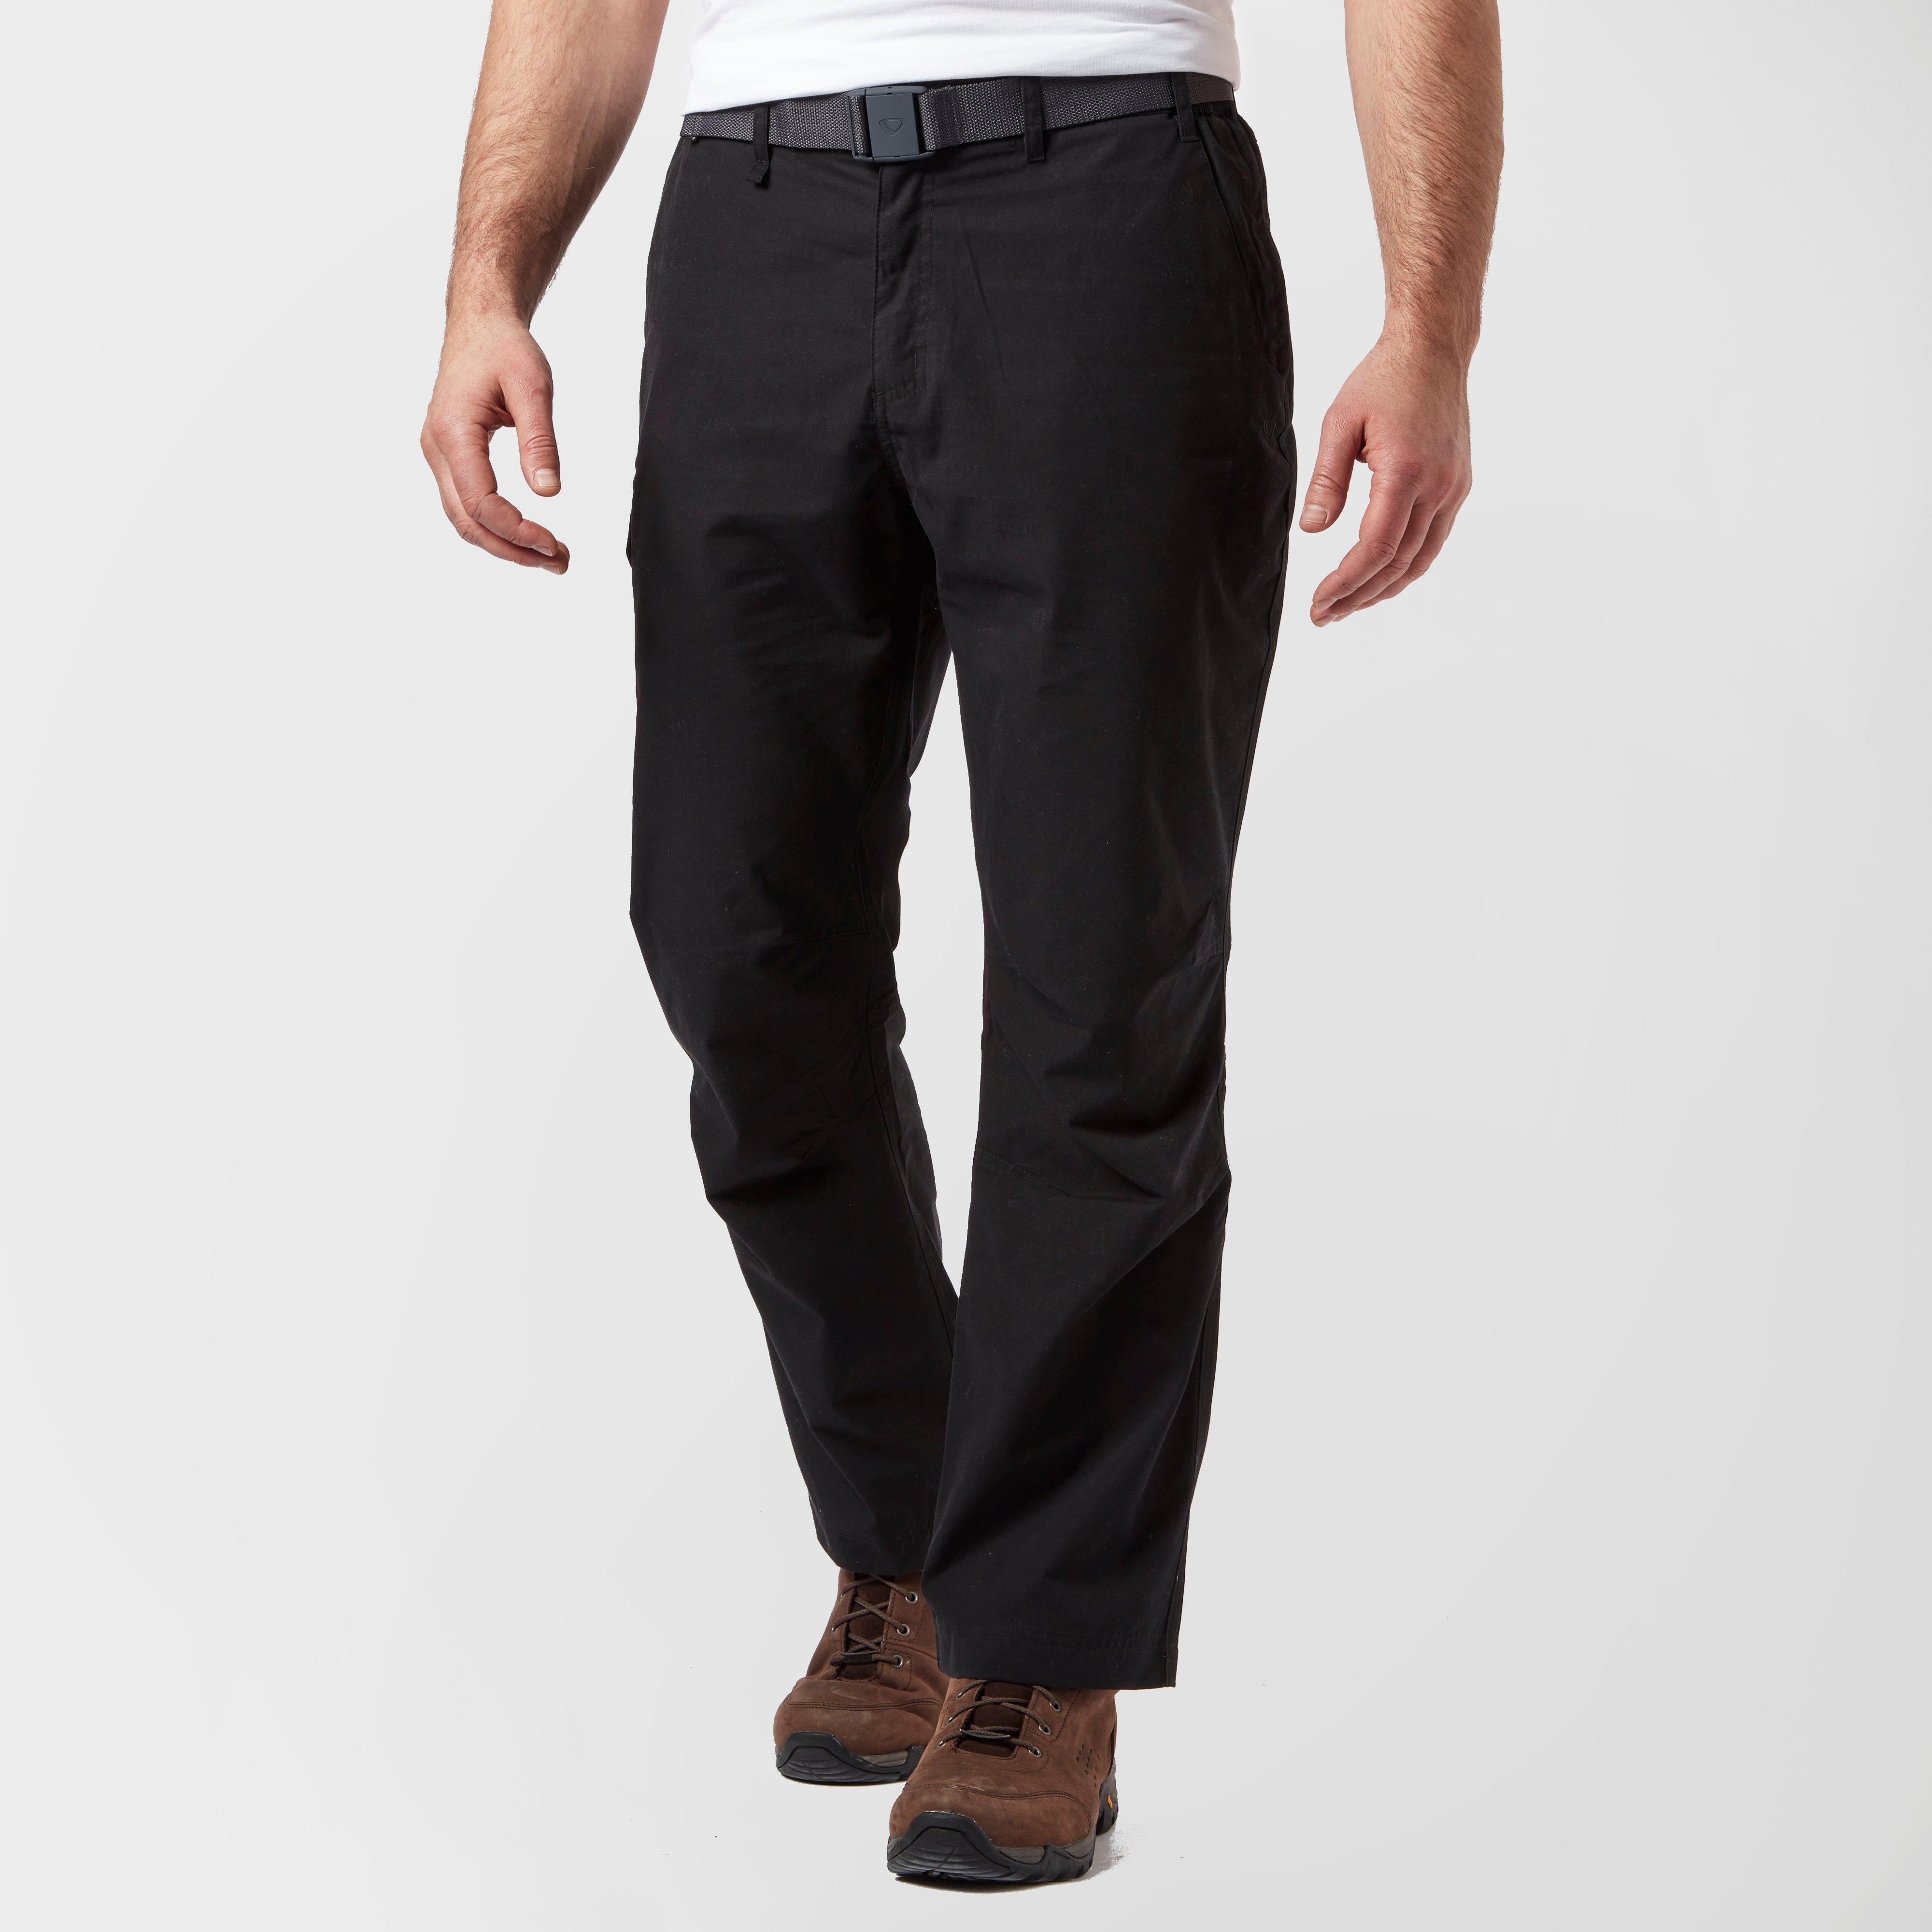 Brasher Mens Walking Trousers - Black/blk  Black/blk